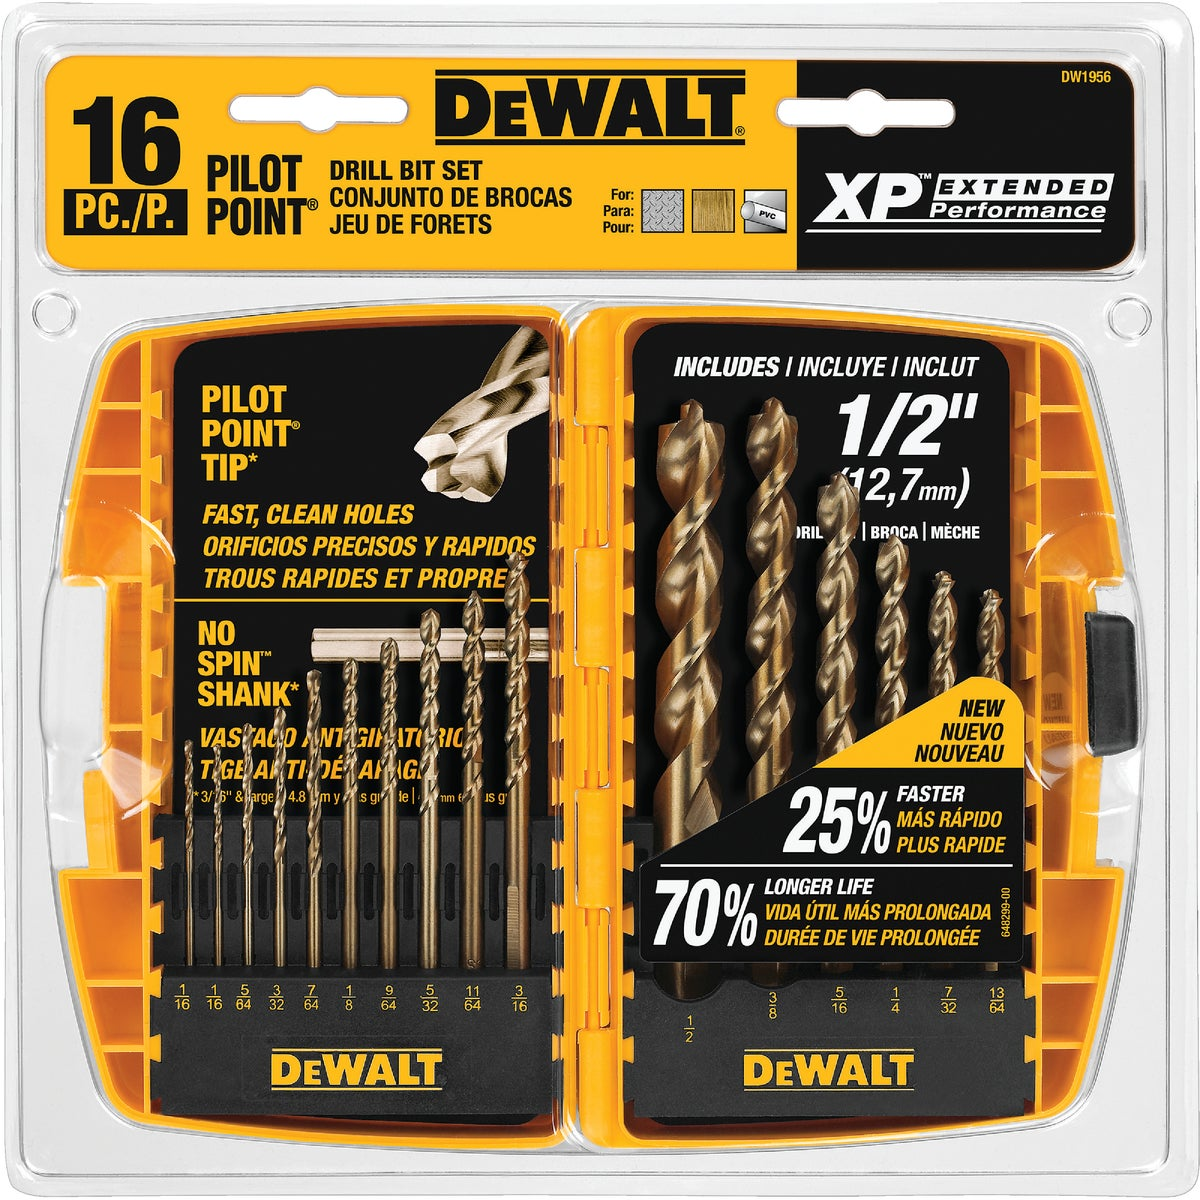 16PC DRILL BIT SET - DW1956 by DeWalt